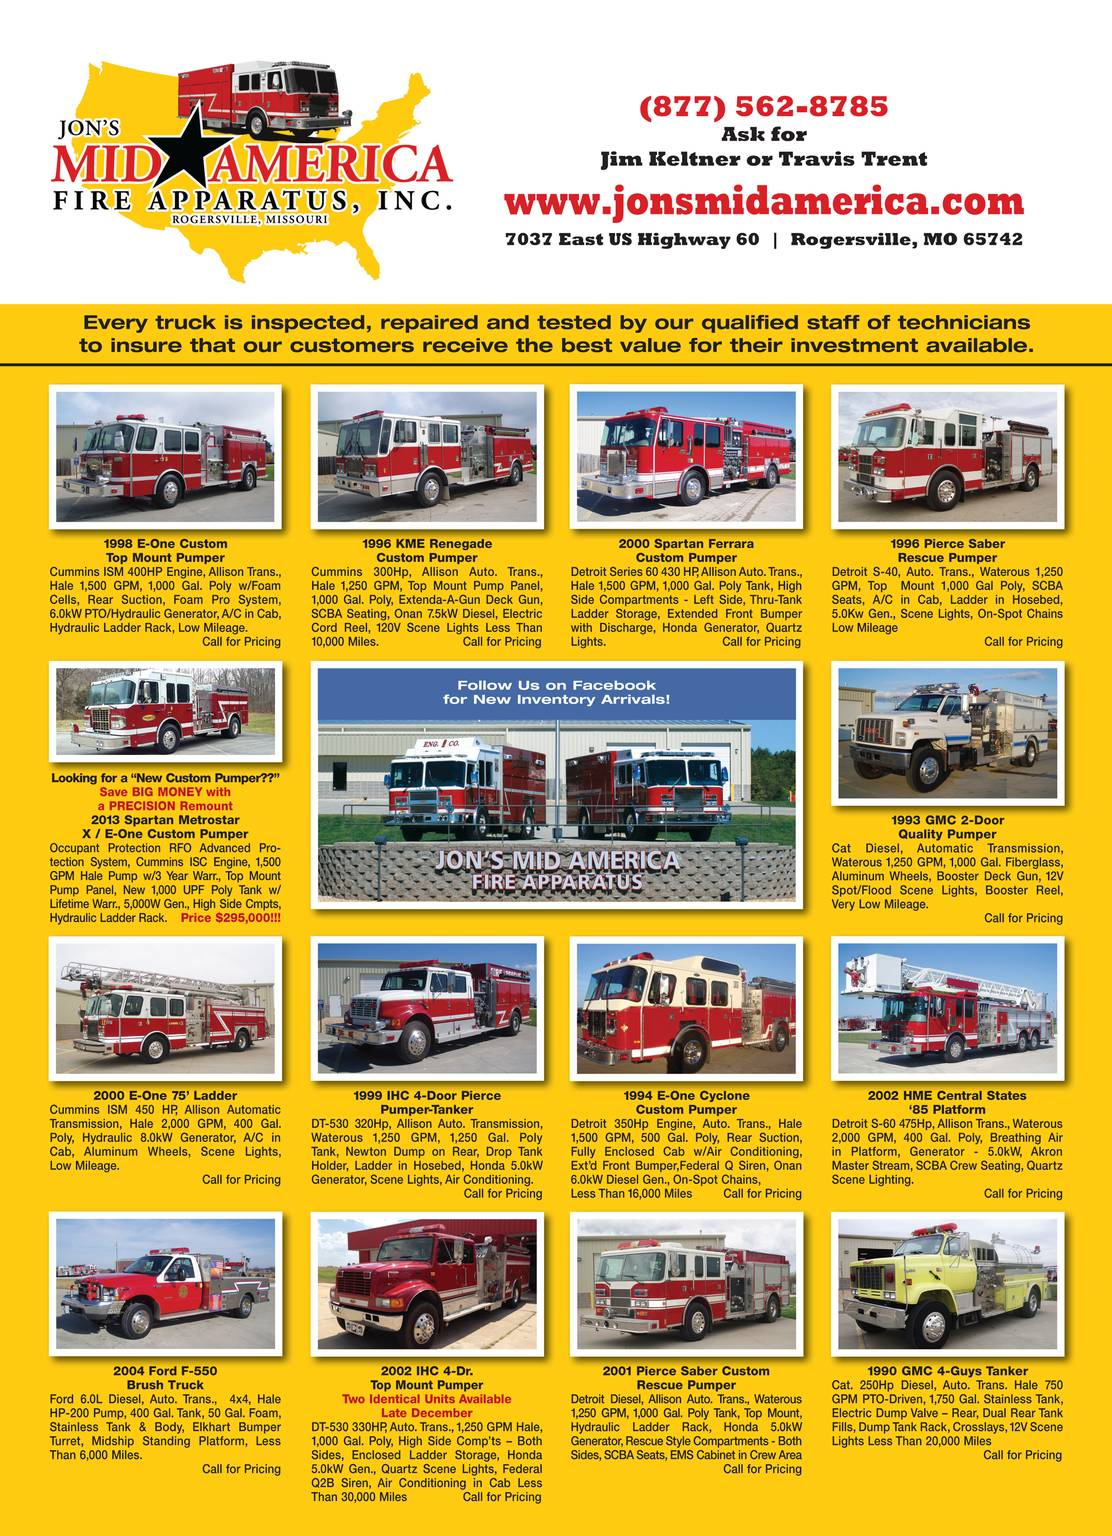 Fire Apparatus Magazine - January 2014 - page 43